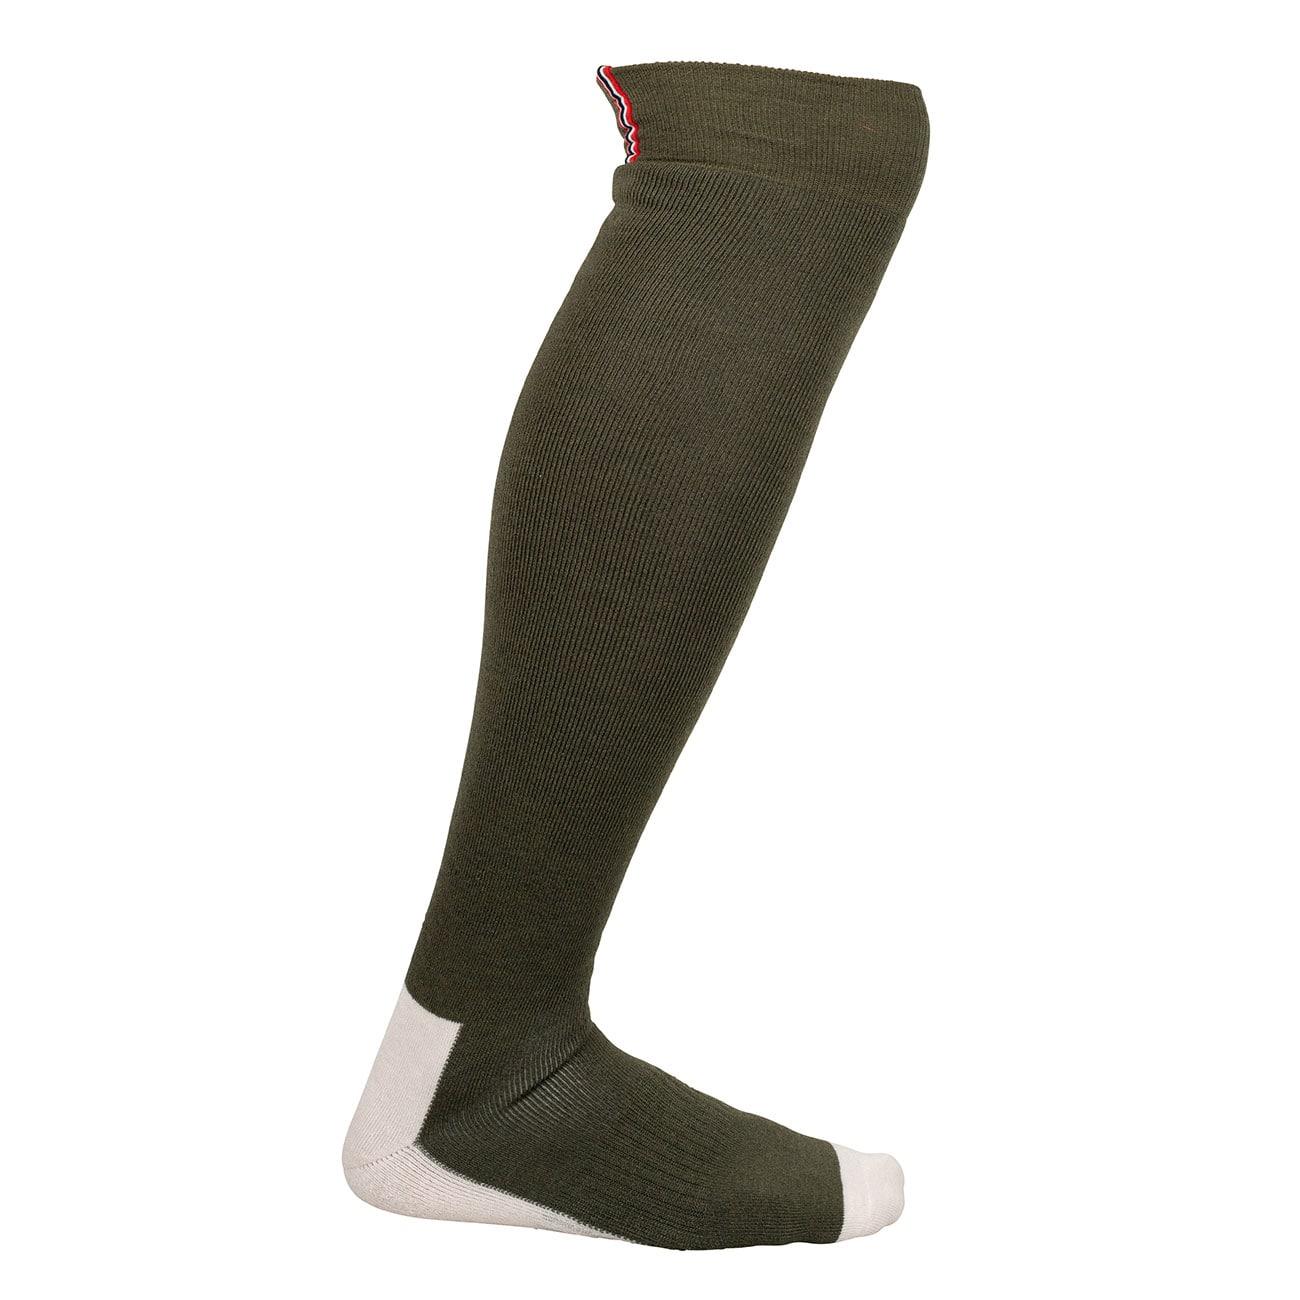 Amundsen Sports Comfy Sock